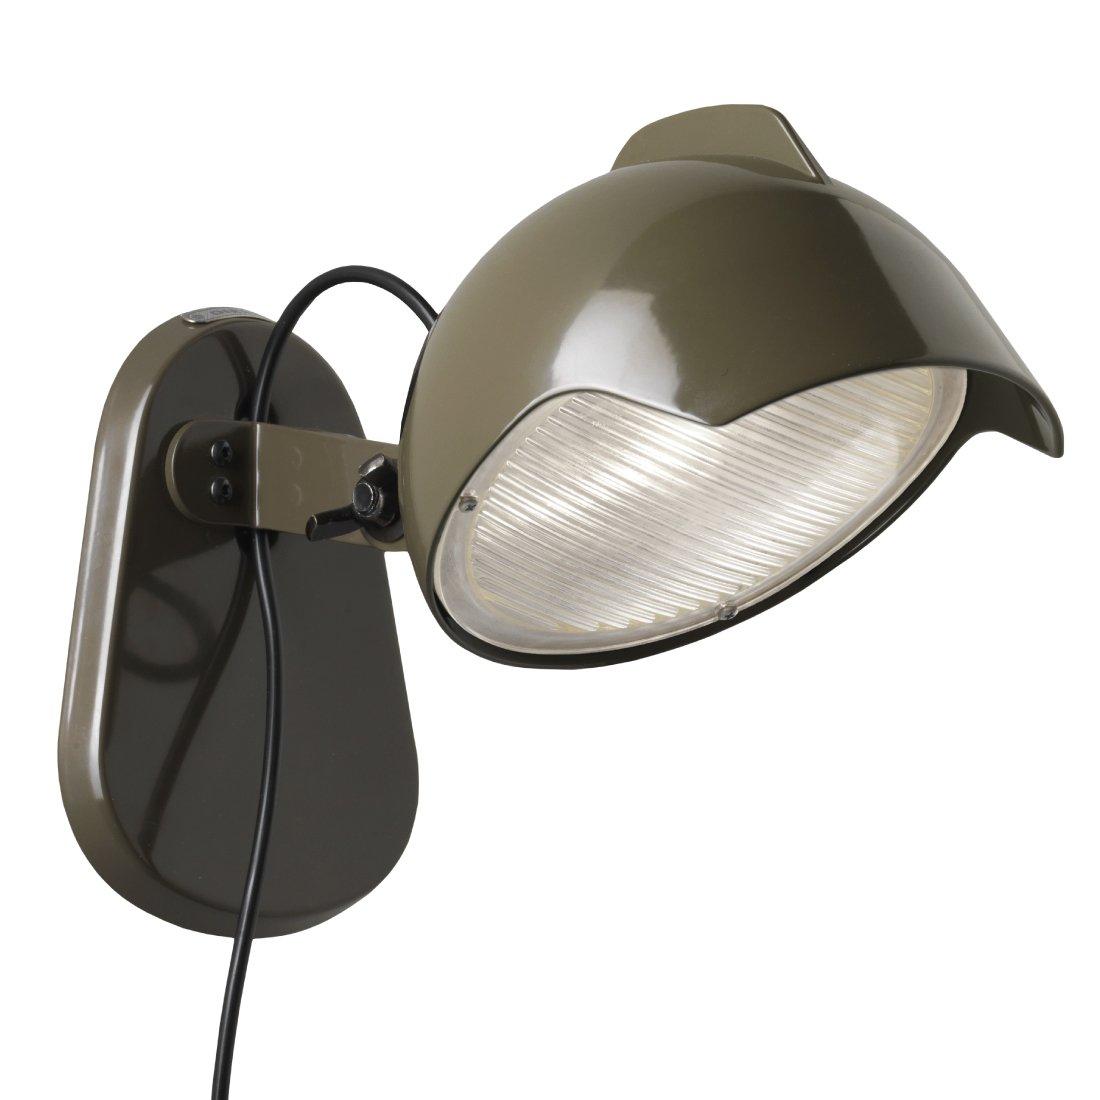 Duii Mini Wandlamp - Diesel